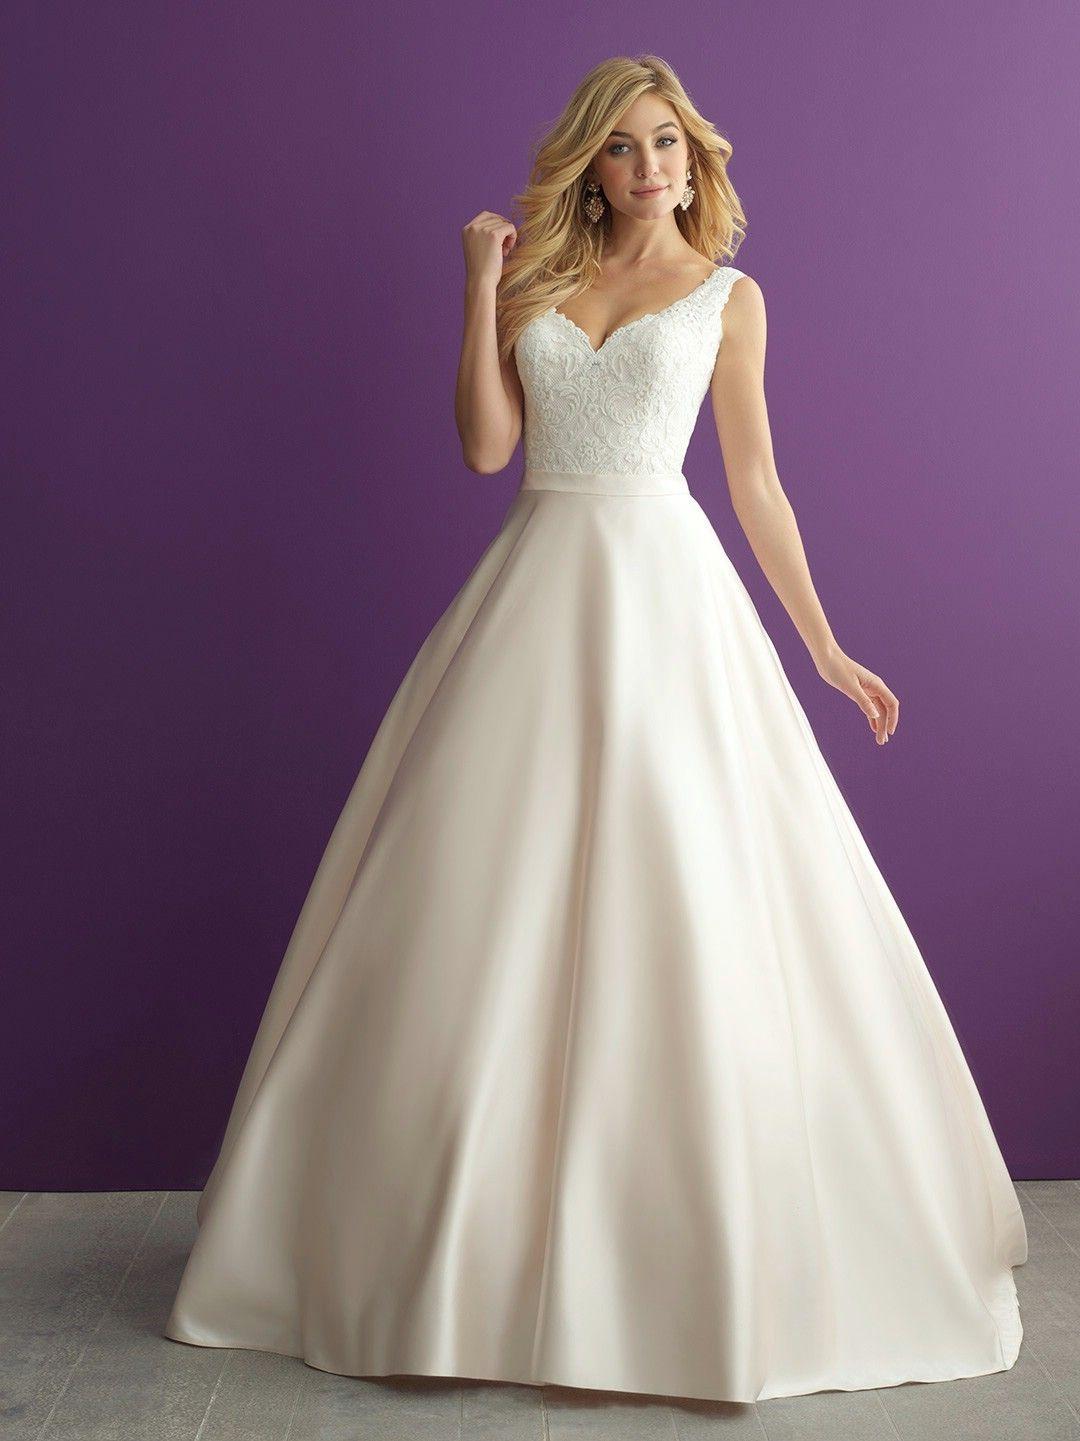 Bridal wedding dresses  Wedding Dresses Bridesmaid Dresses Prom Dresses and Bridal Dresses